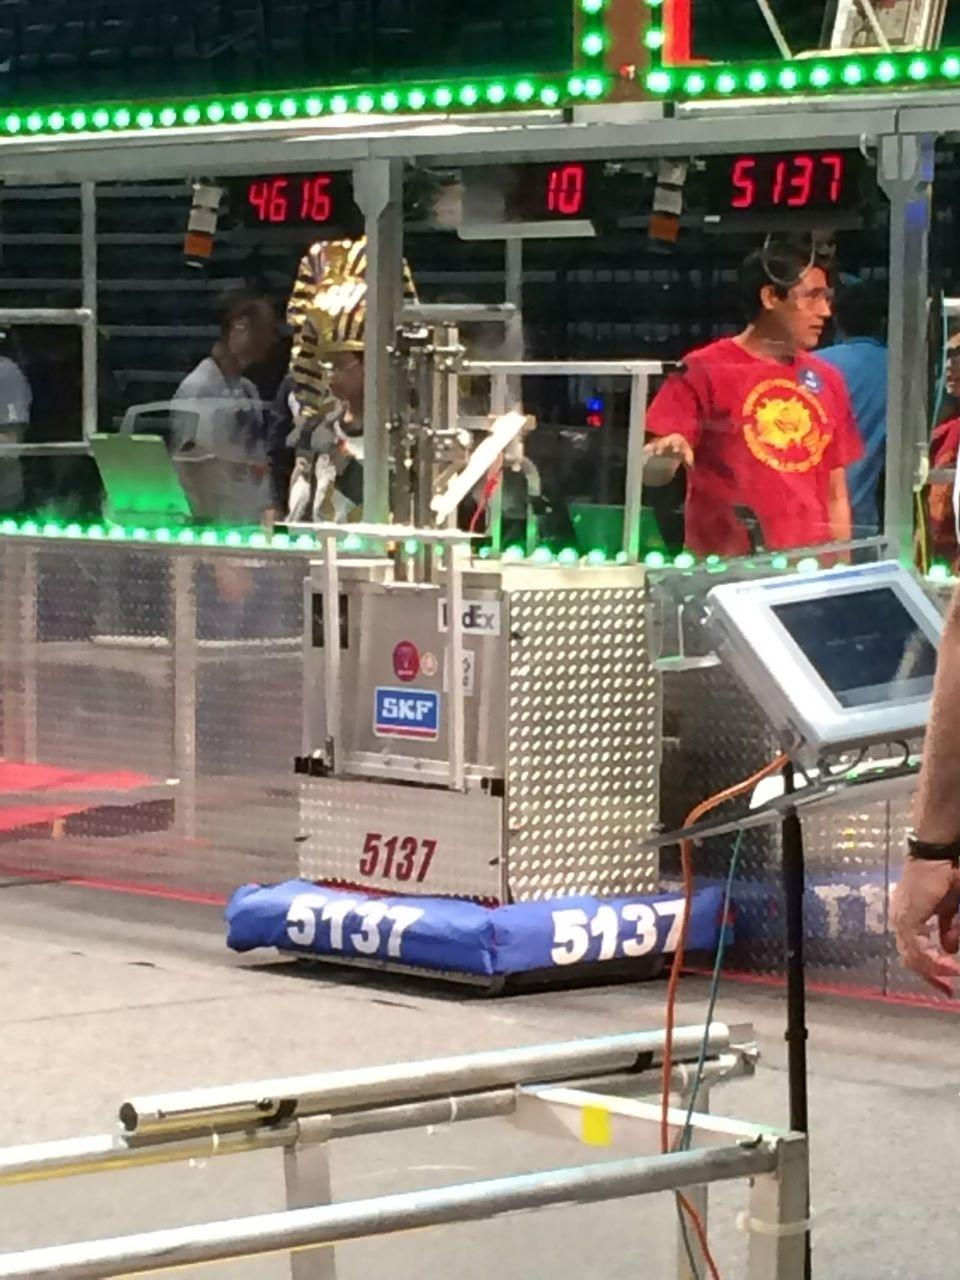 MHHS Iron Kodiaks Winning Defensive Robot